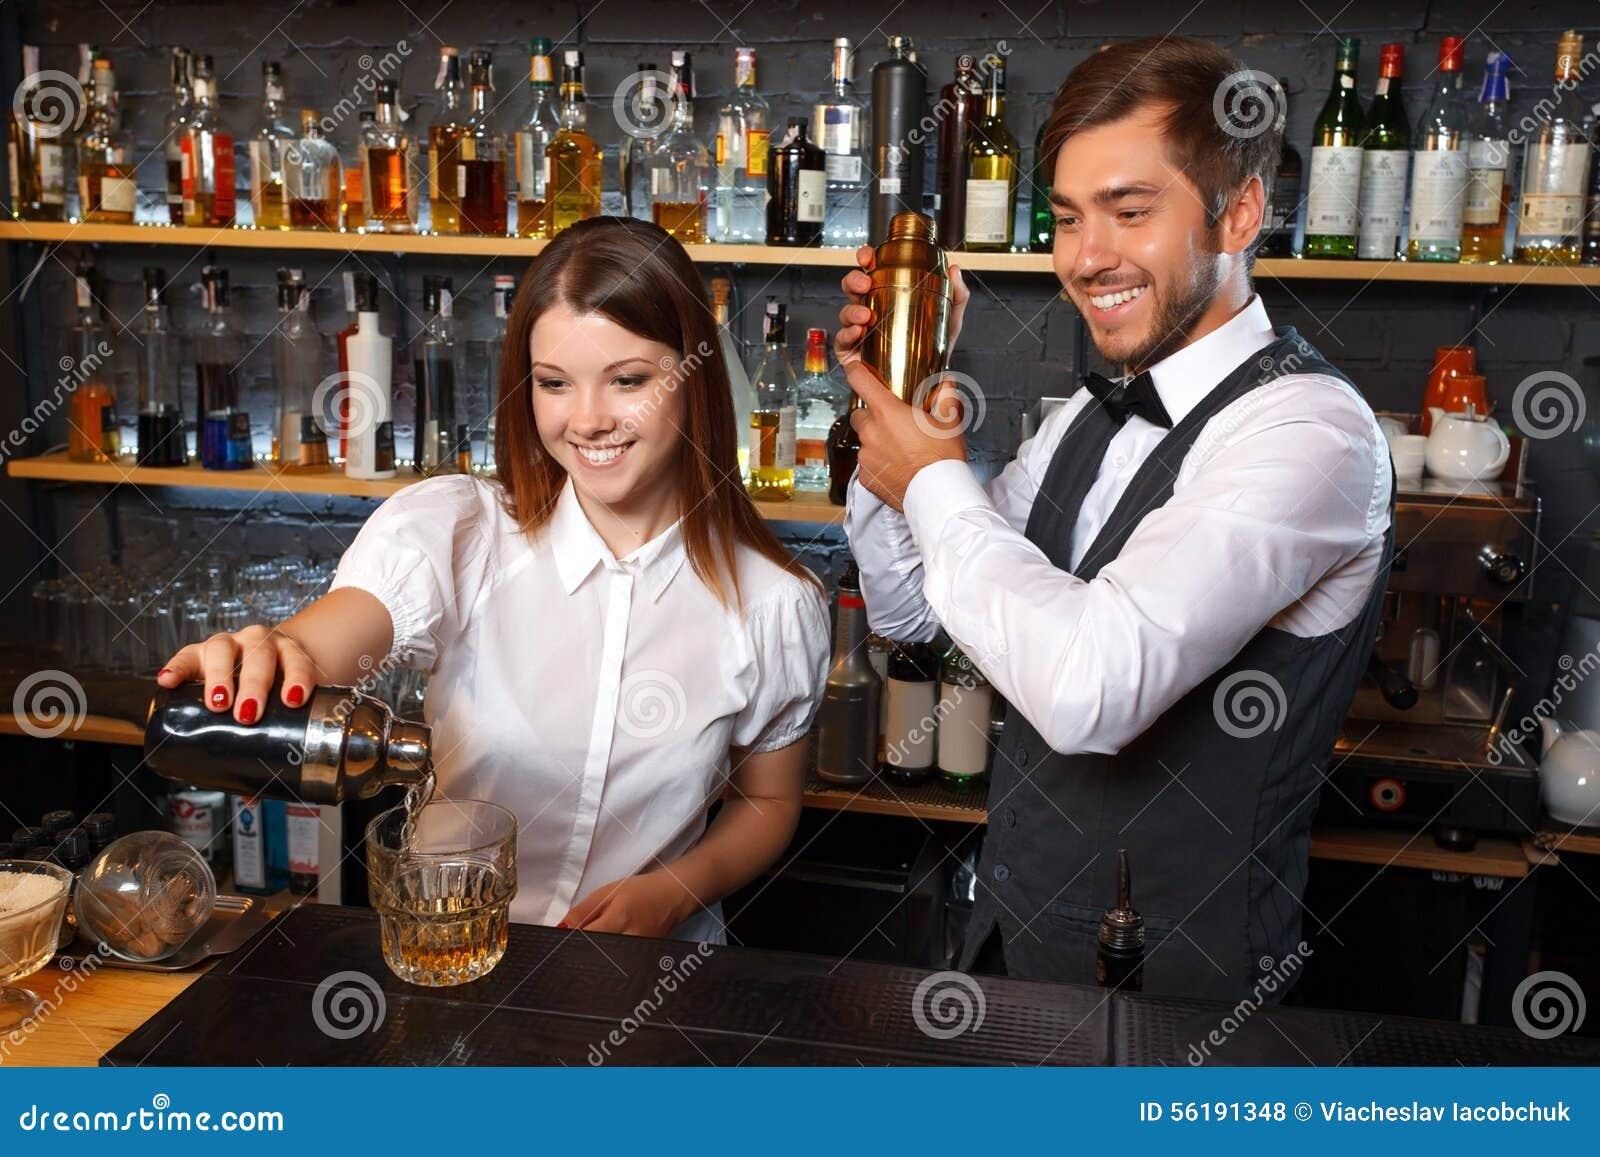 Официантки в трусиках в баре фото 668-268